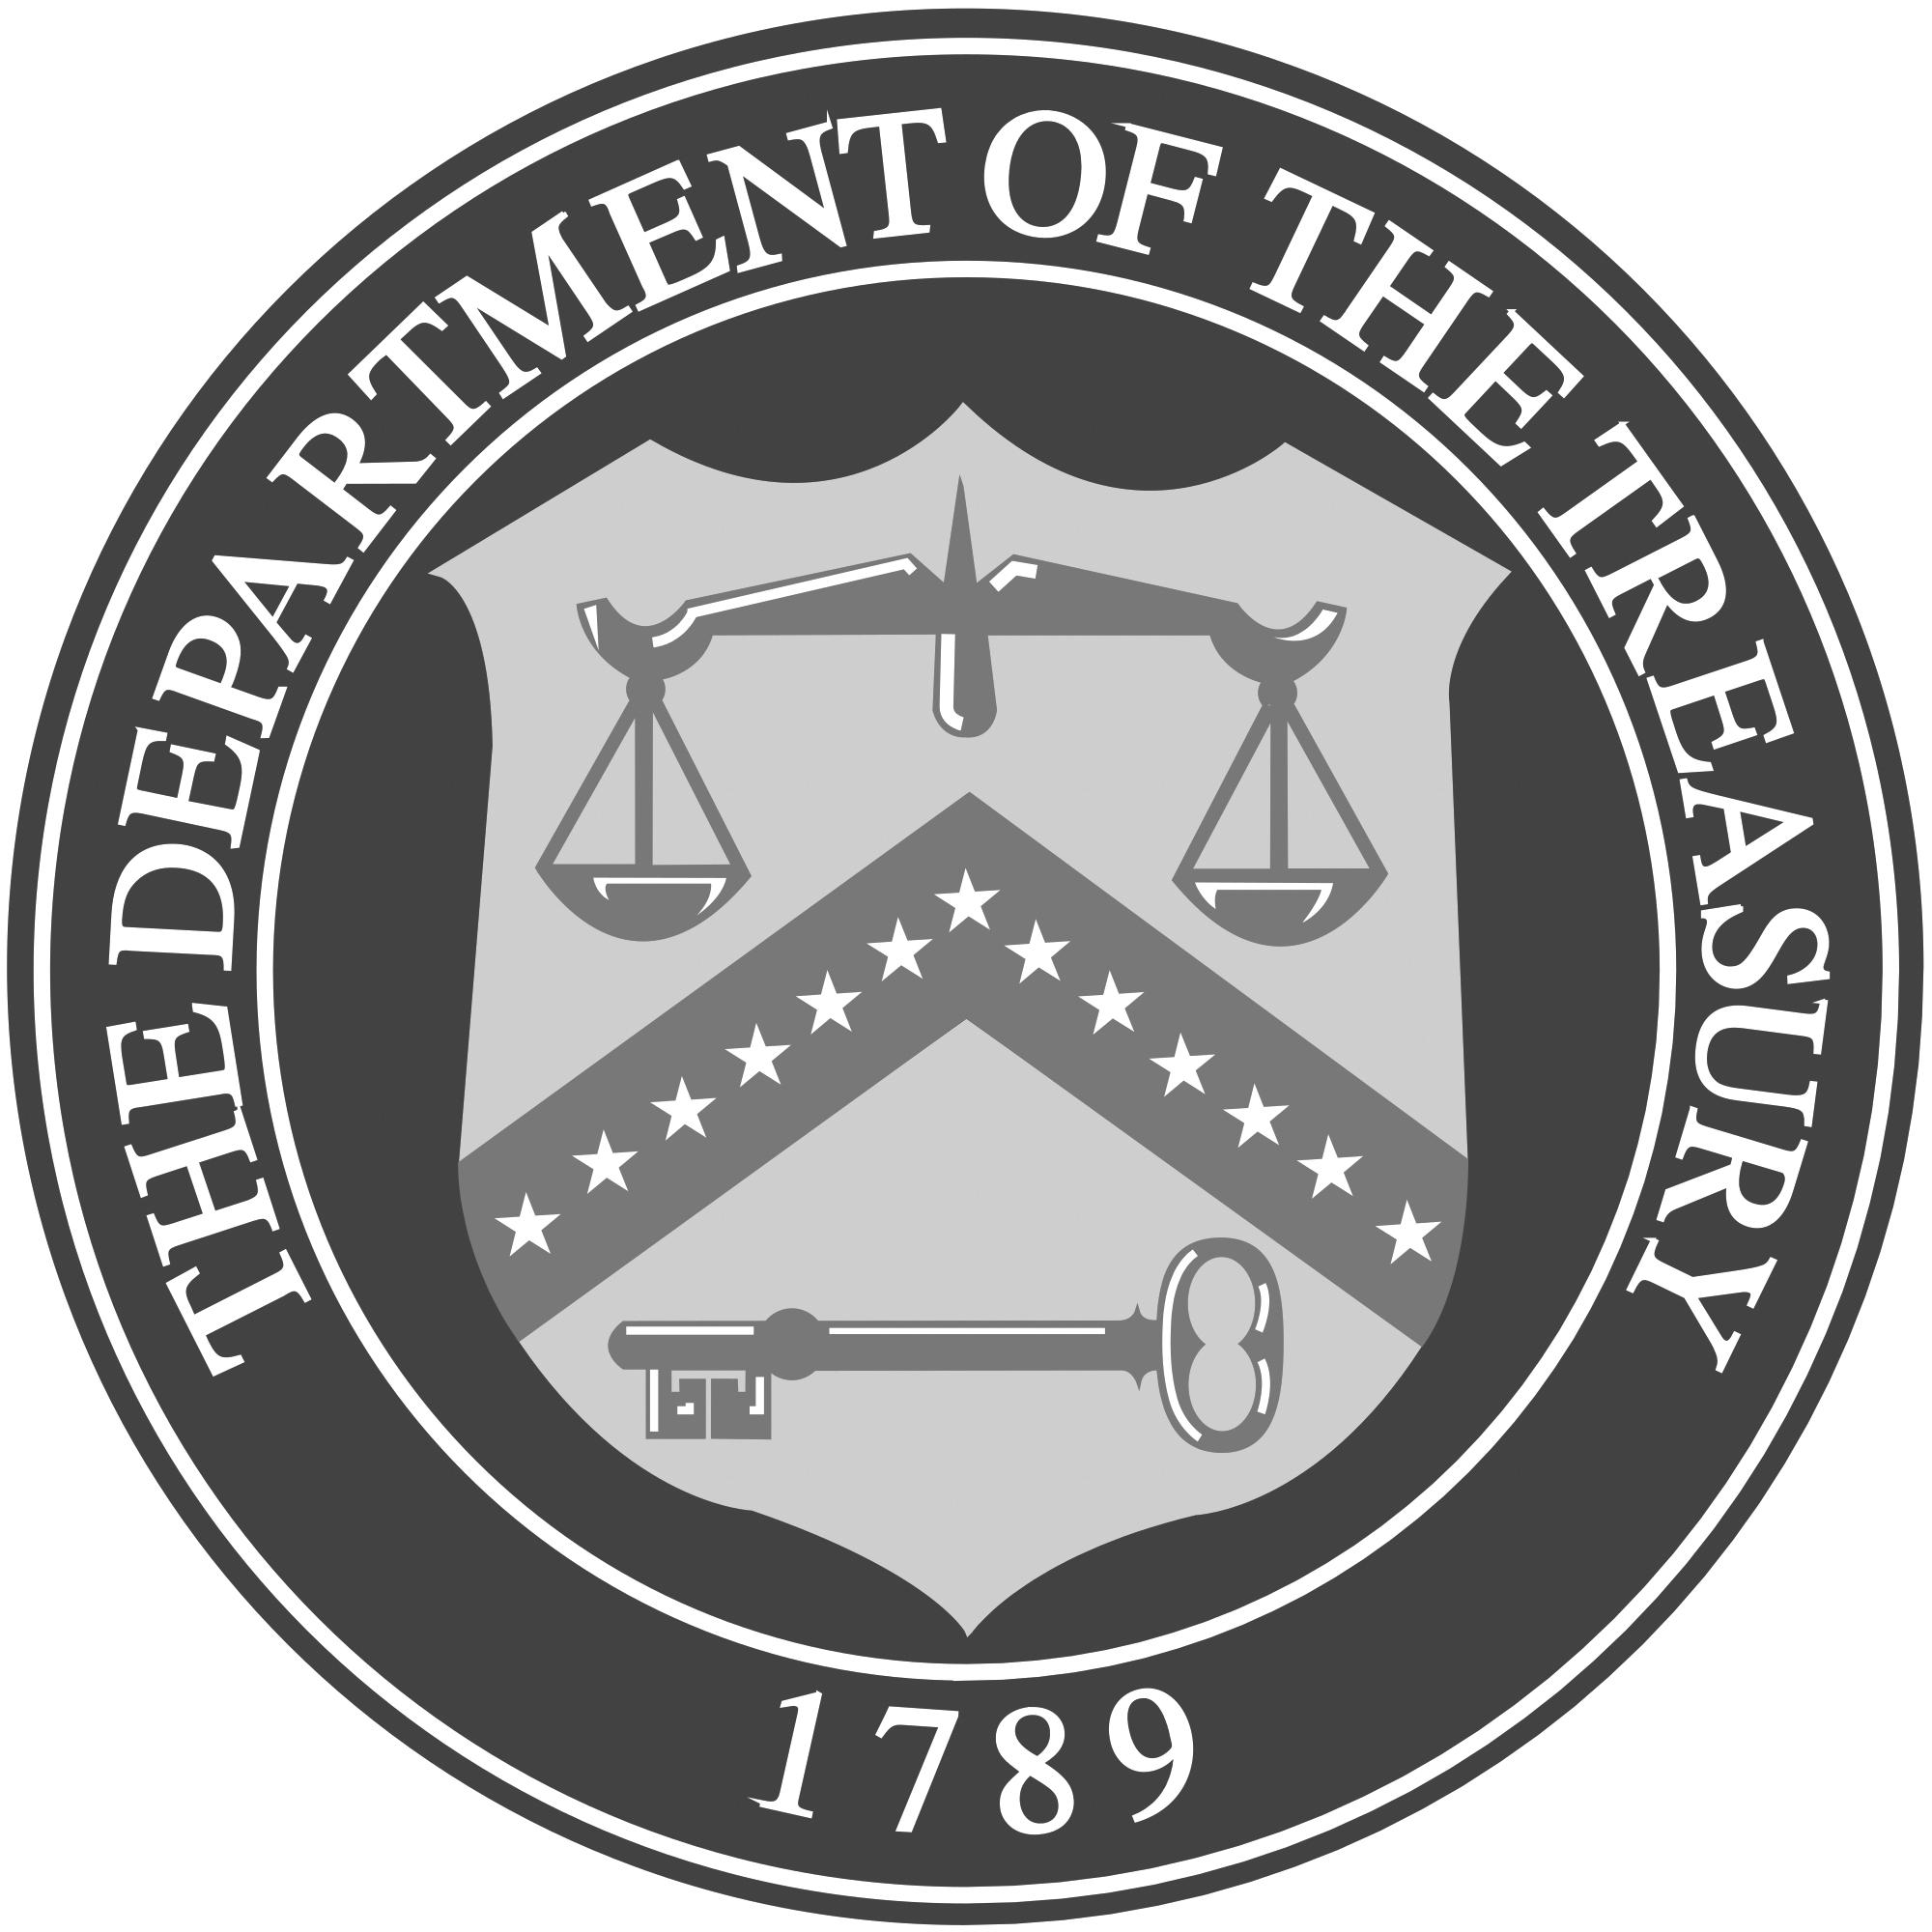 Department of treasury logo grey